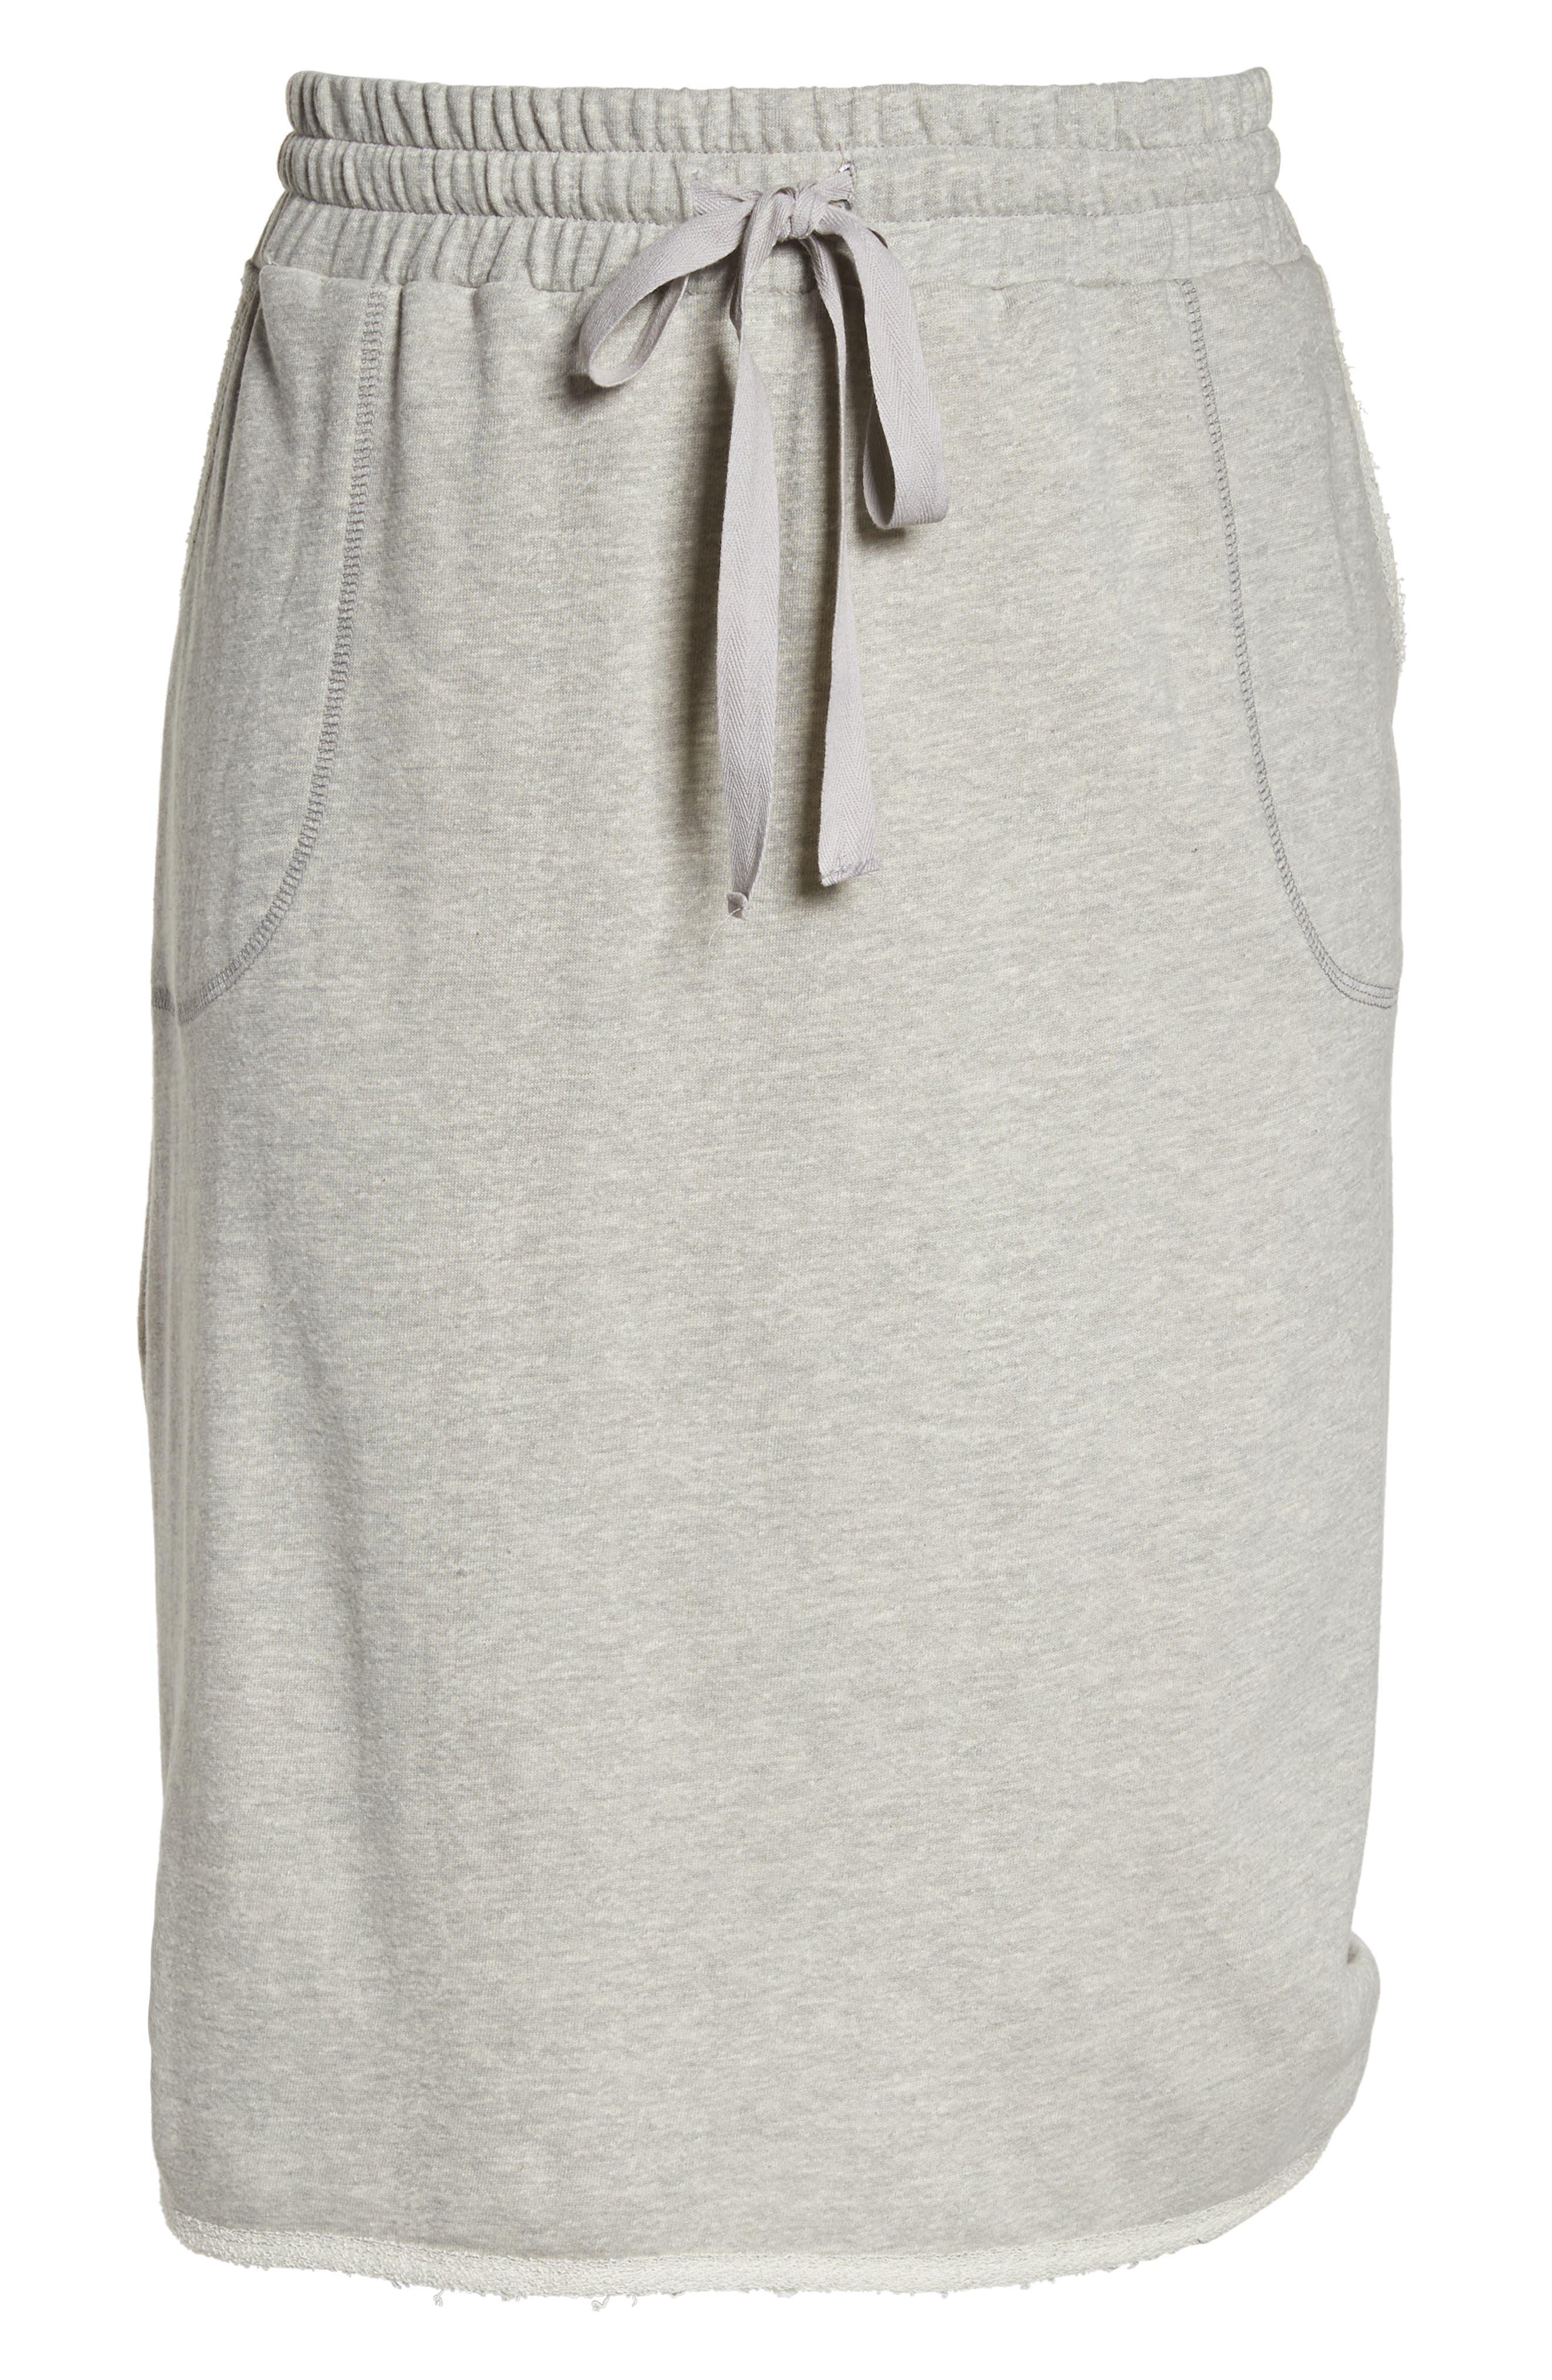 Drawstring Knit Skirt,                             Alternate thumbnail 7, color,                             030